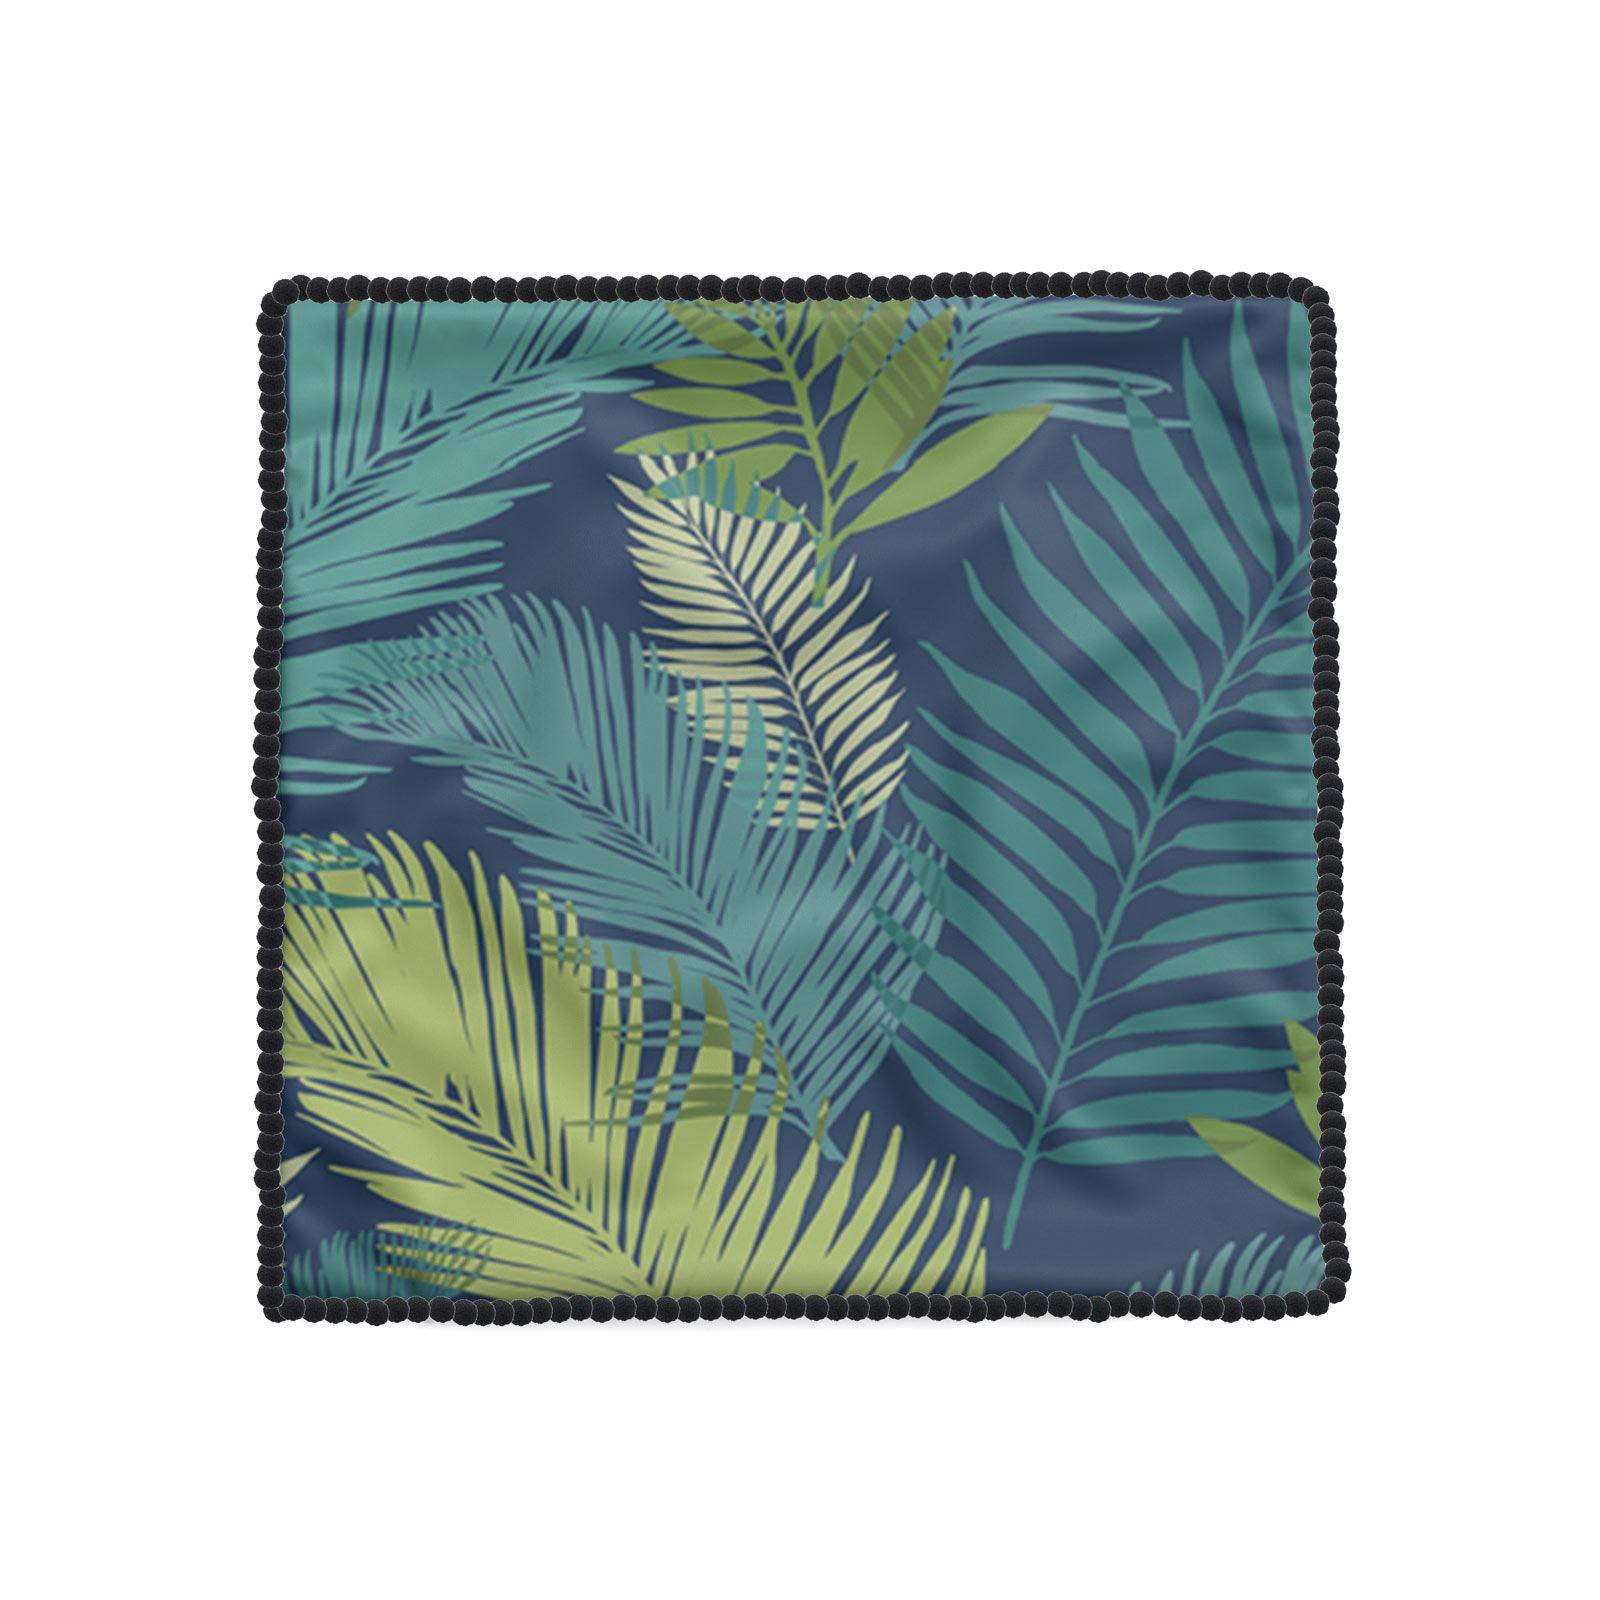 Teal-Blue-Duck-Egg-Cushion-Covers-18-034-x18-034-45cm-x-45cm-Luxury-Cover thumbnail 4